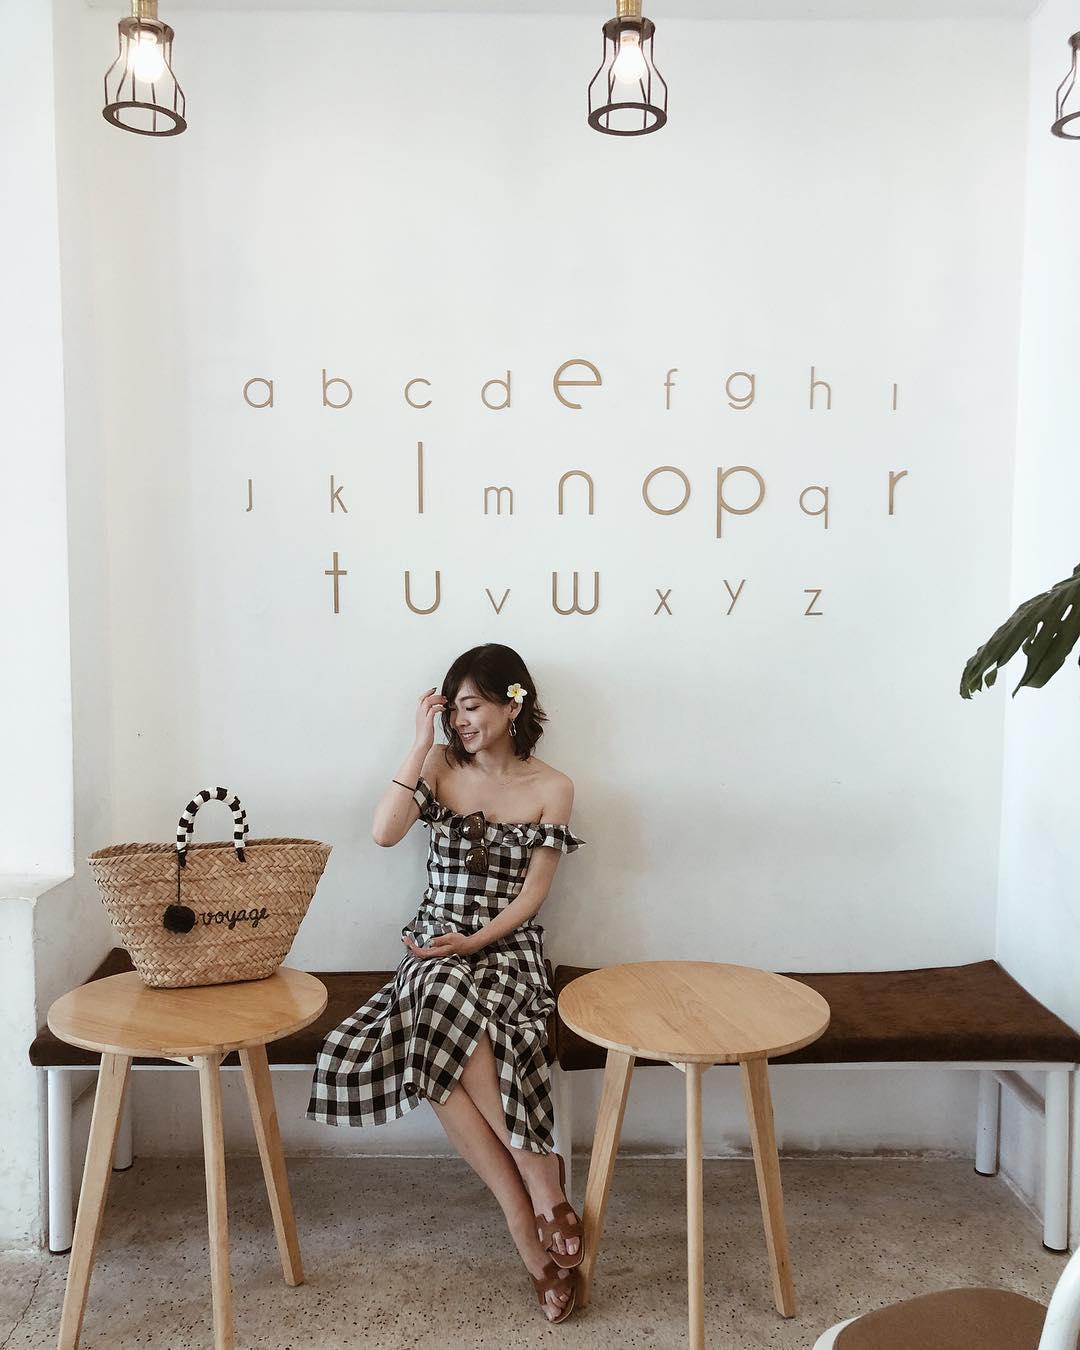 cafe-da-nang